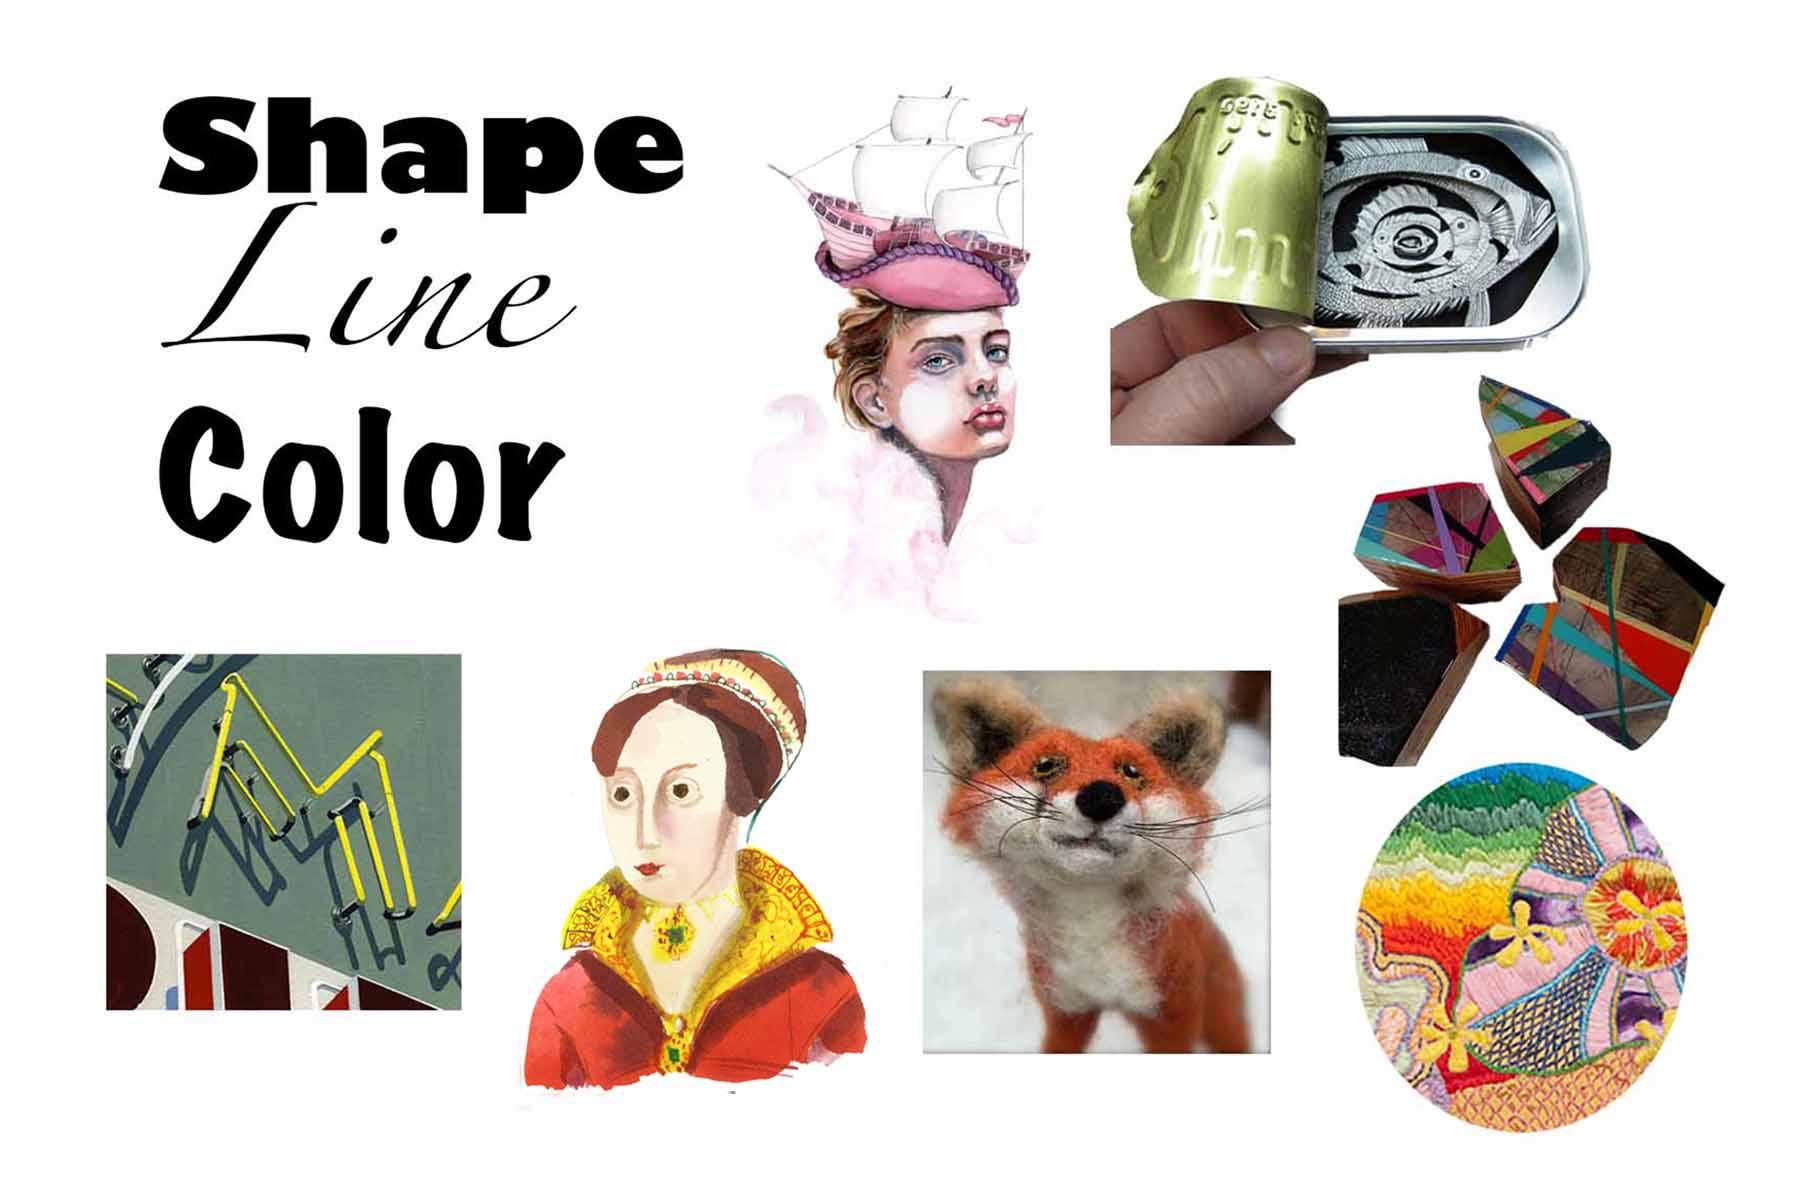 shapelinecolorcard